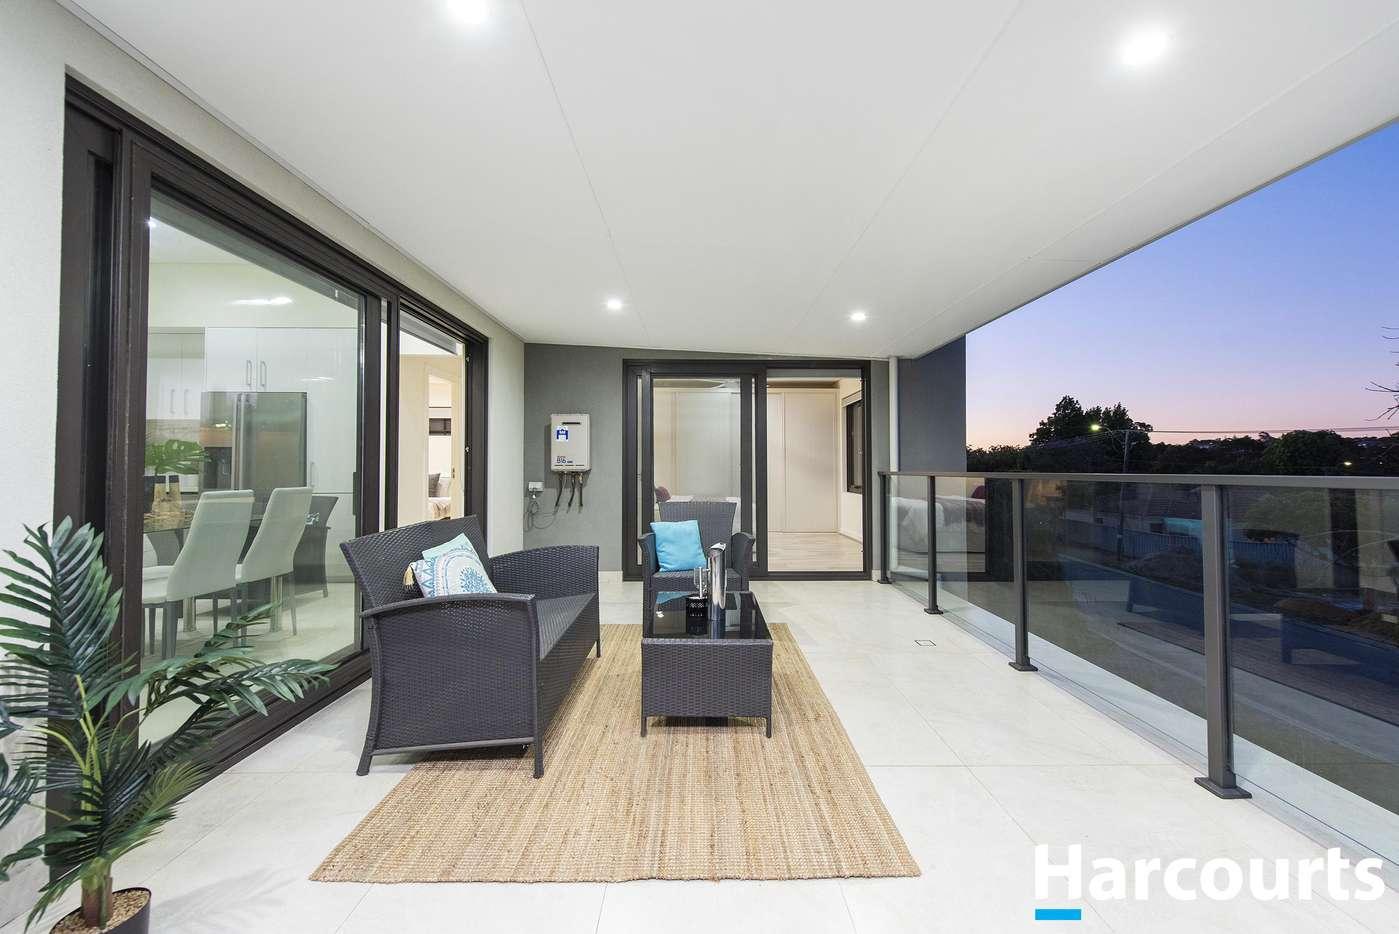 Main view of Homely apartment listing, 4/17 Elanora Street, Joondanna, WA 6060